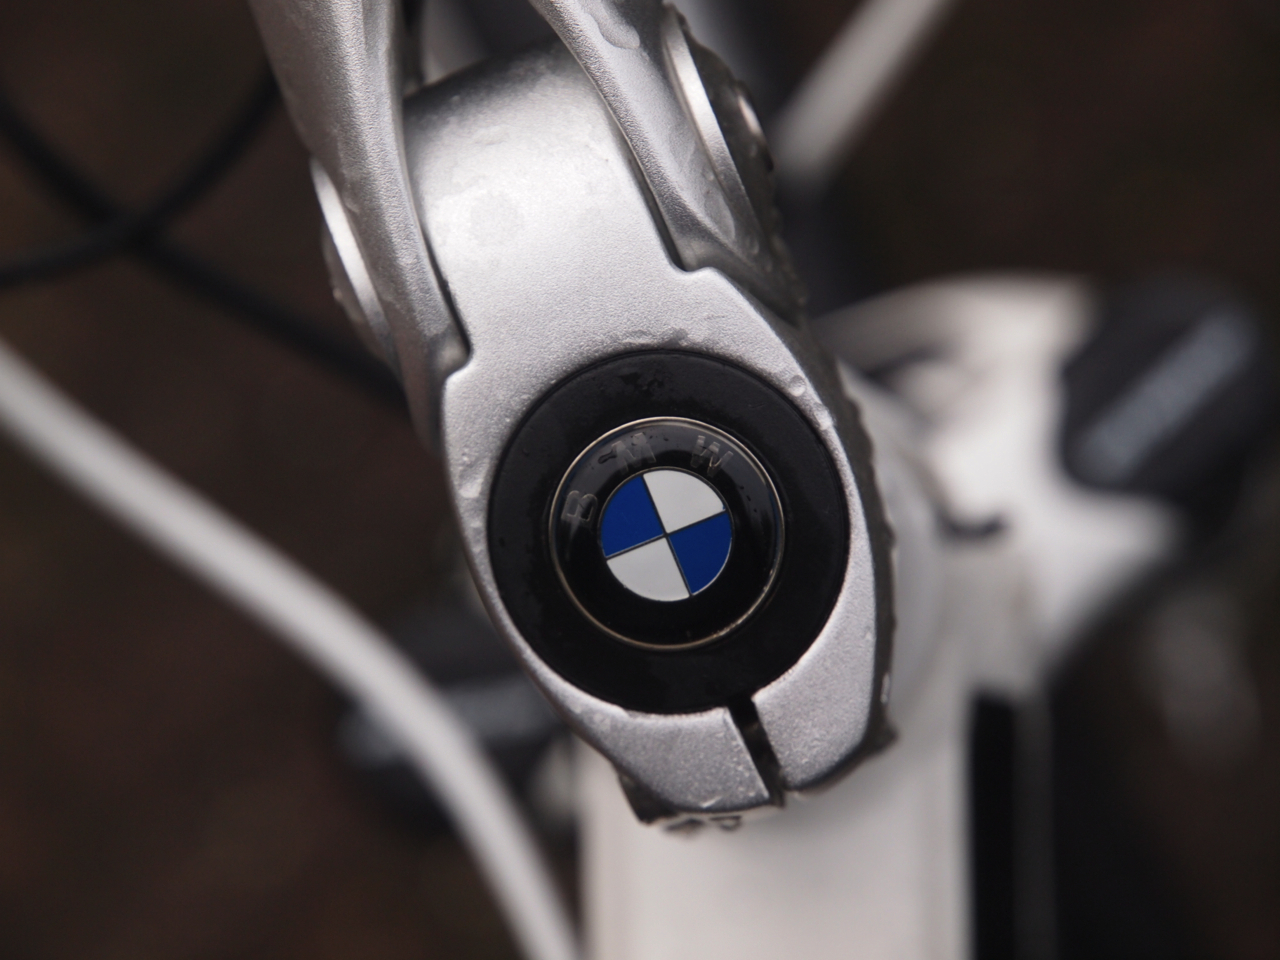 Bmw Cruise E Bike 2014 Has Turbo Mode Autoevolution